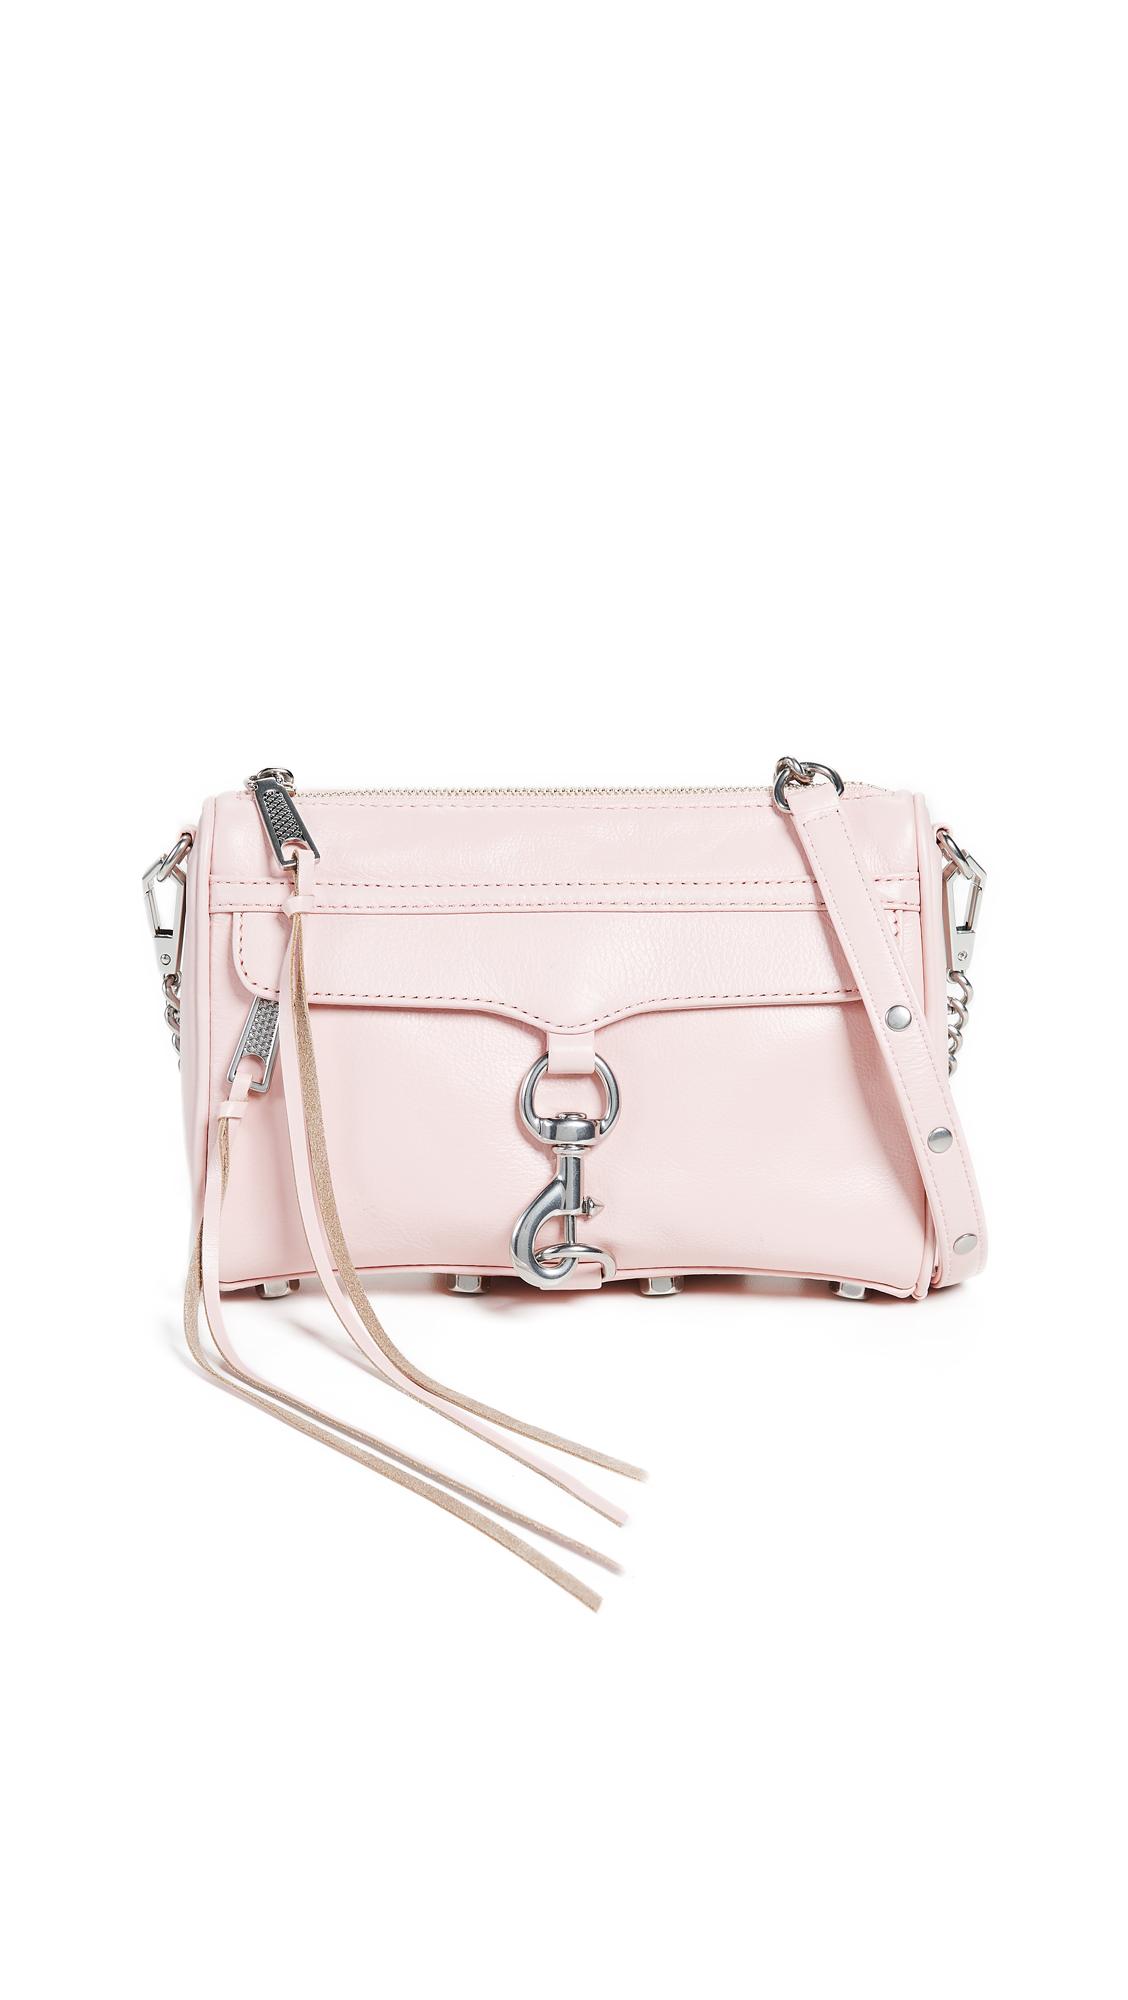 Rebecca Minkoff Mini MAC Cross Body Bag - Blossom